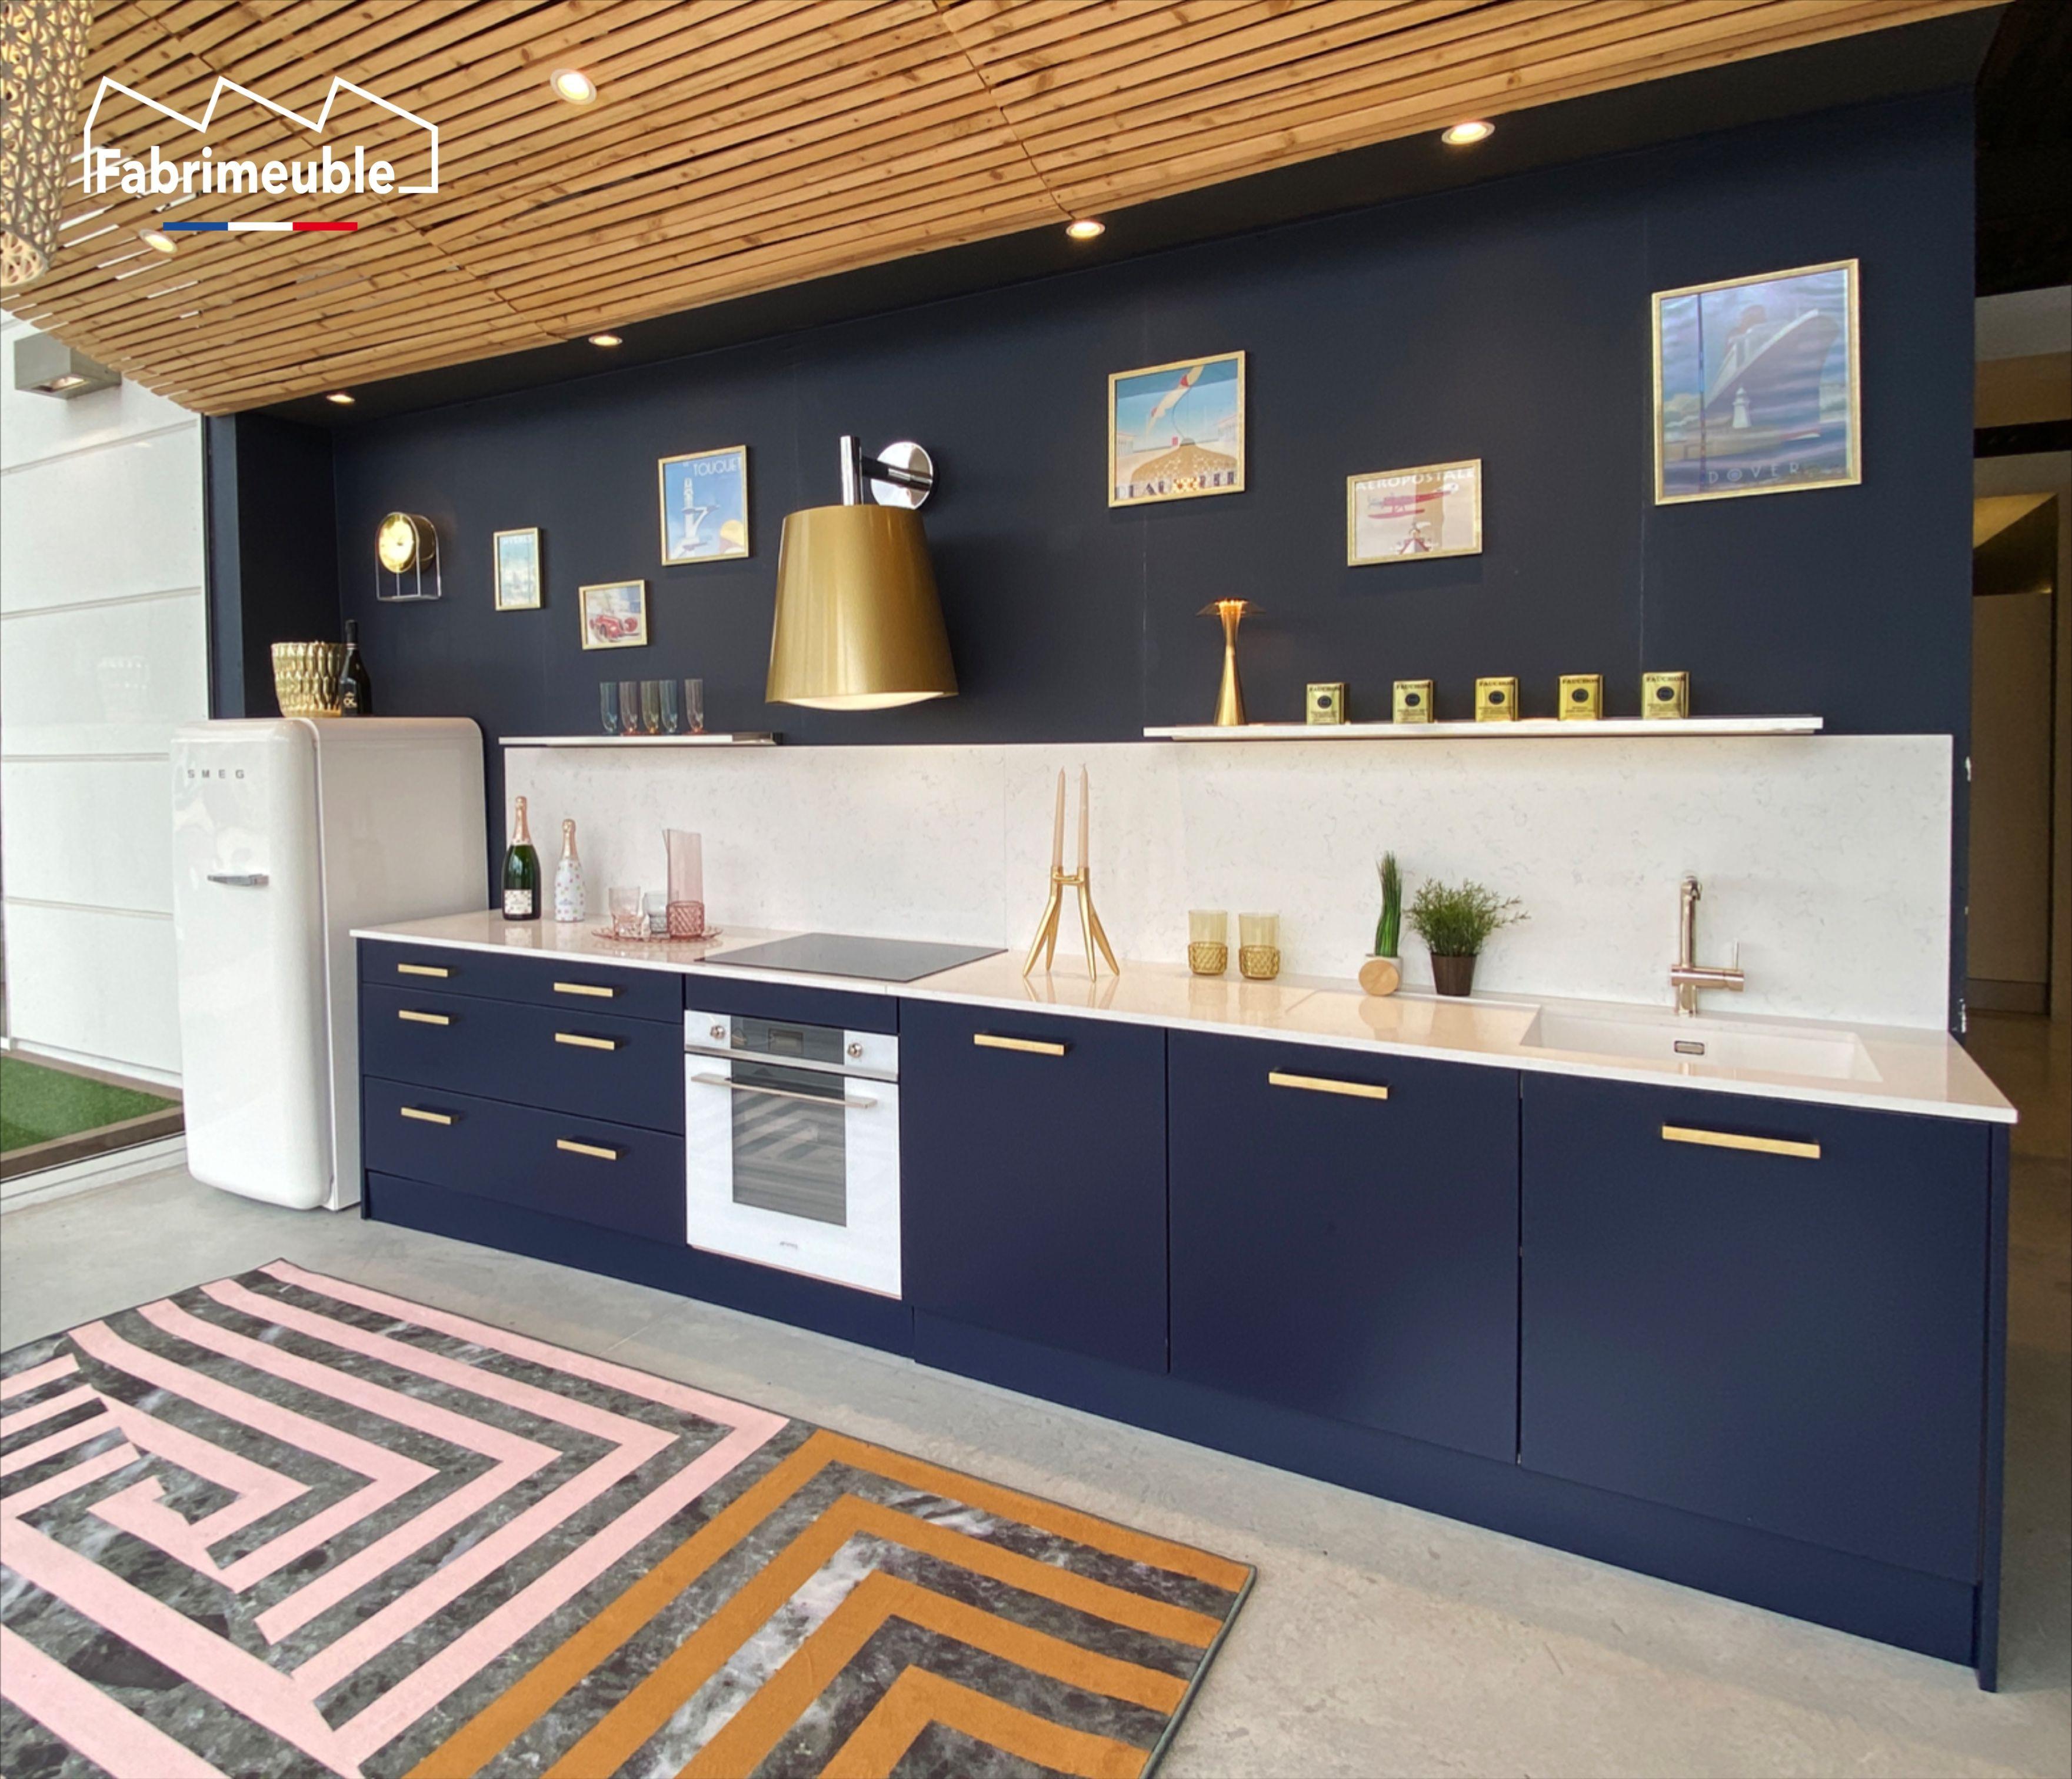 Chaise Masters Or Kartell Design Philippe Starck En 2020 Fabricant Cuisine Cuisine Laquee Decoration Salle De Bain